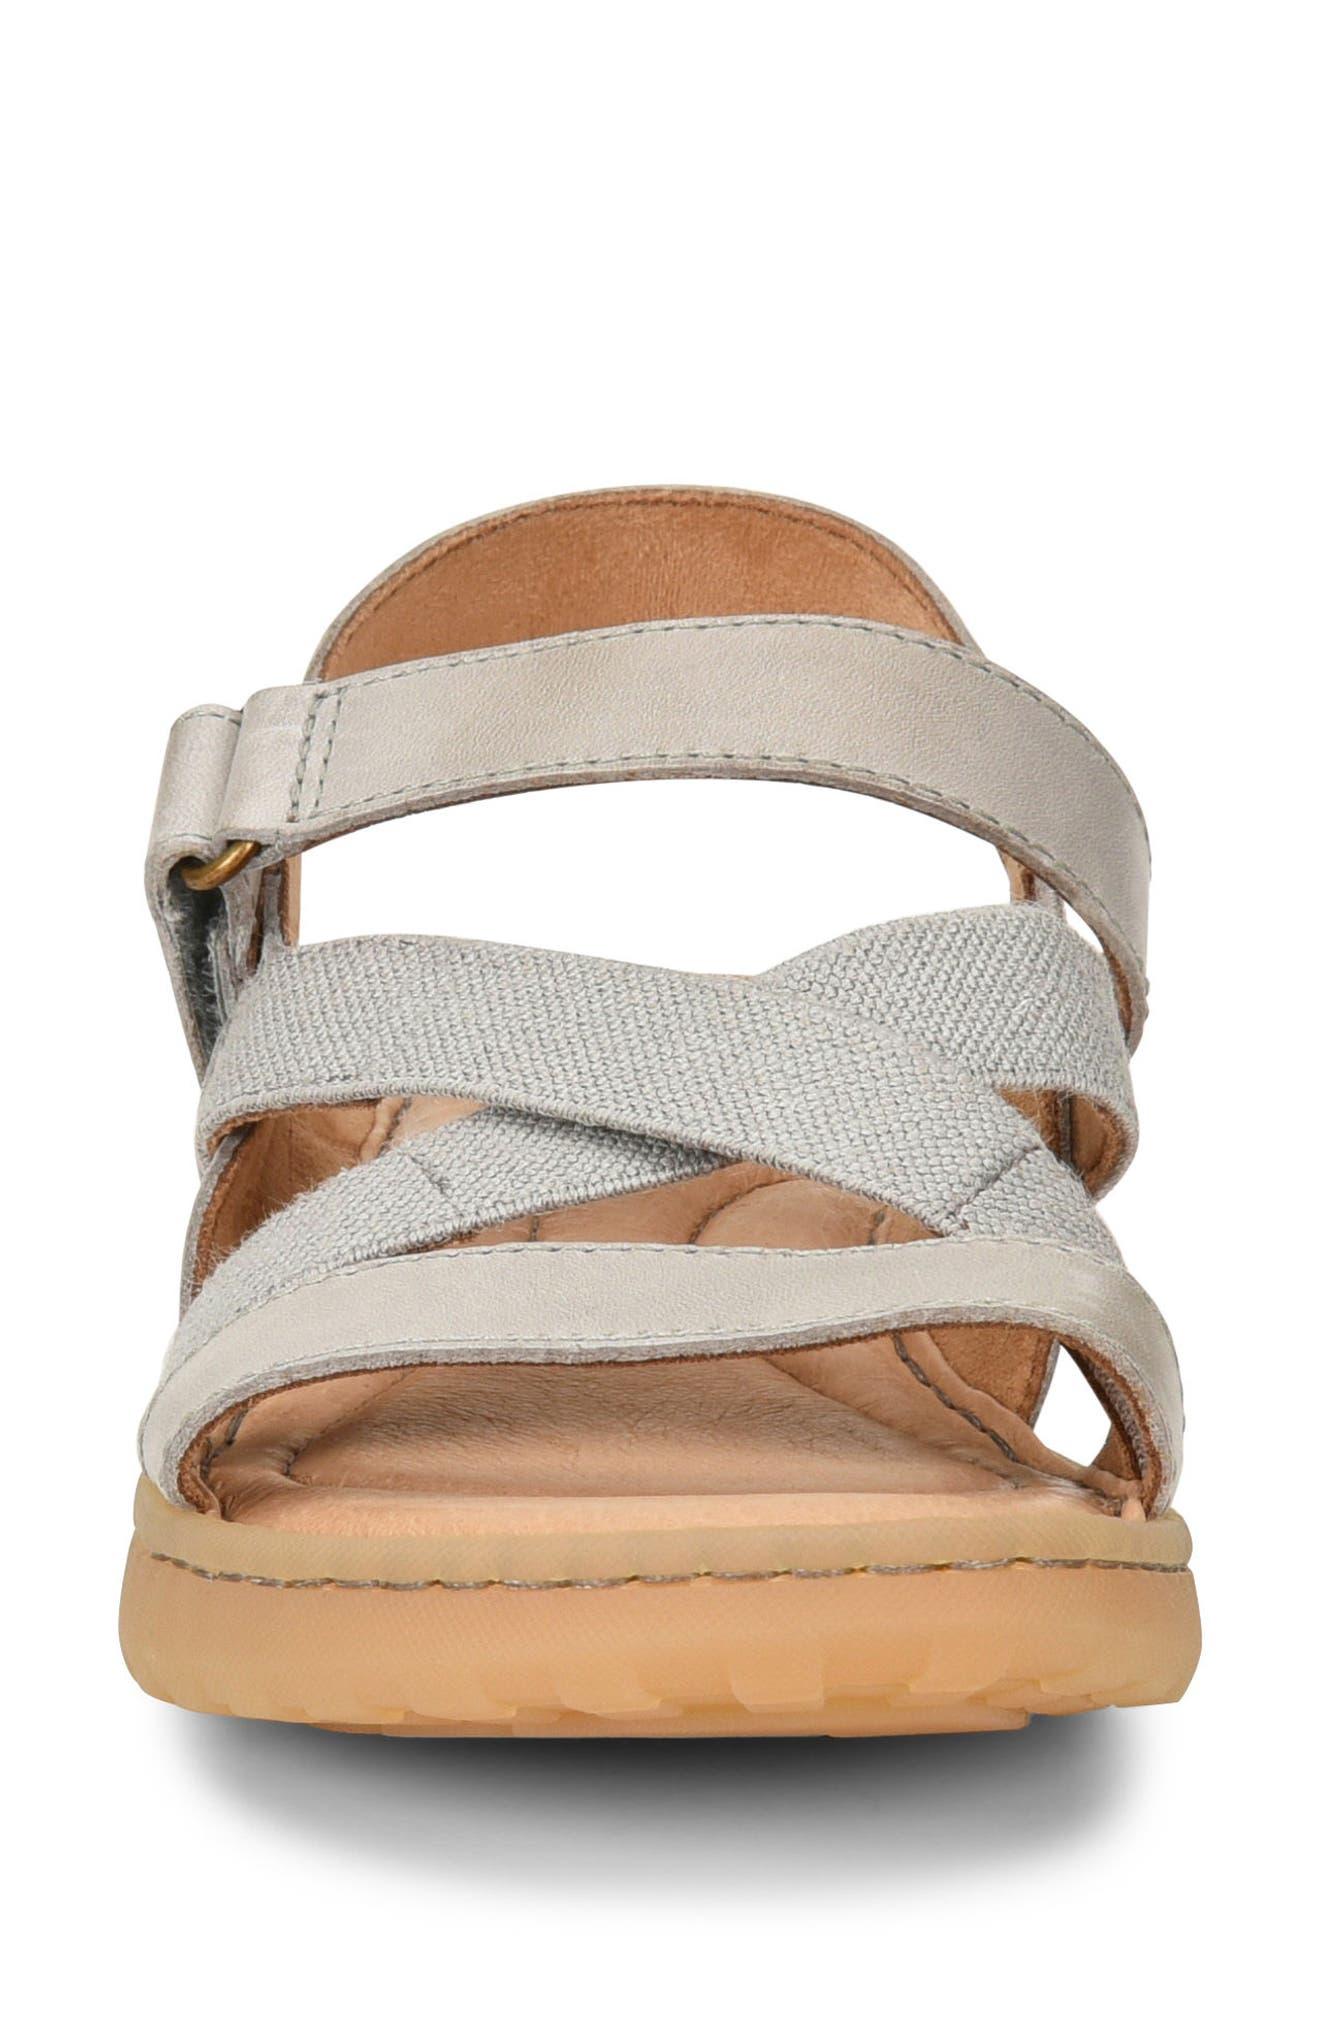 Manta Sandal,                             Alternate thumbnail 4, color,                             Light Grey Leather